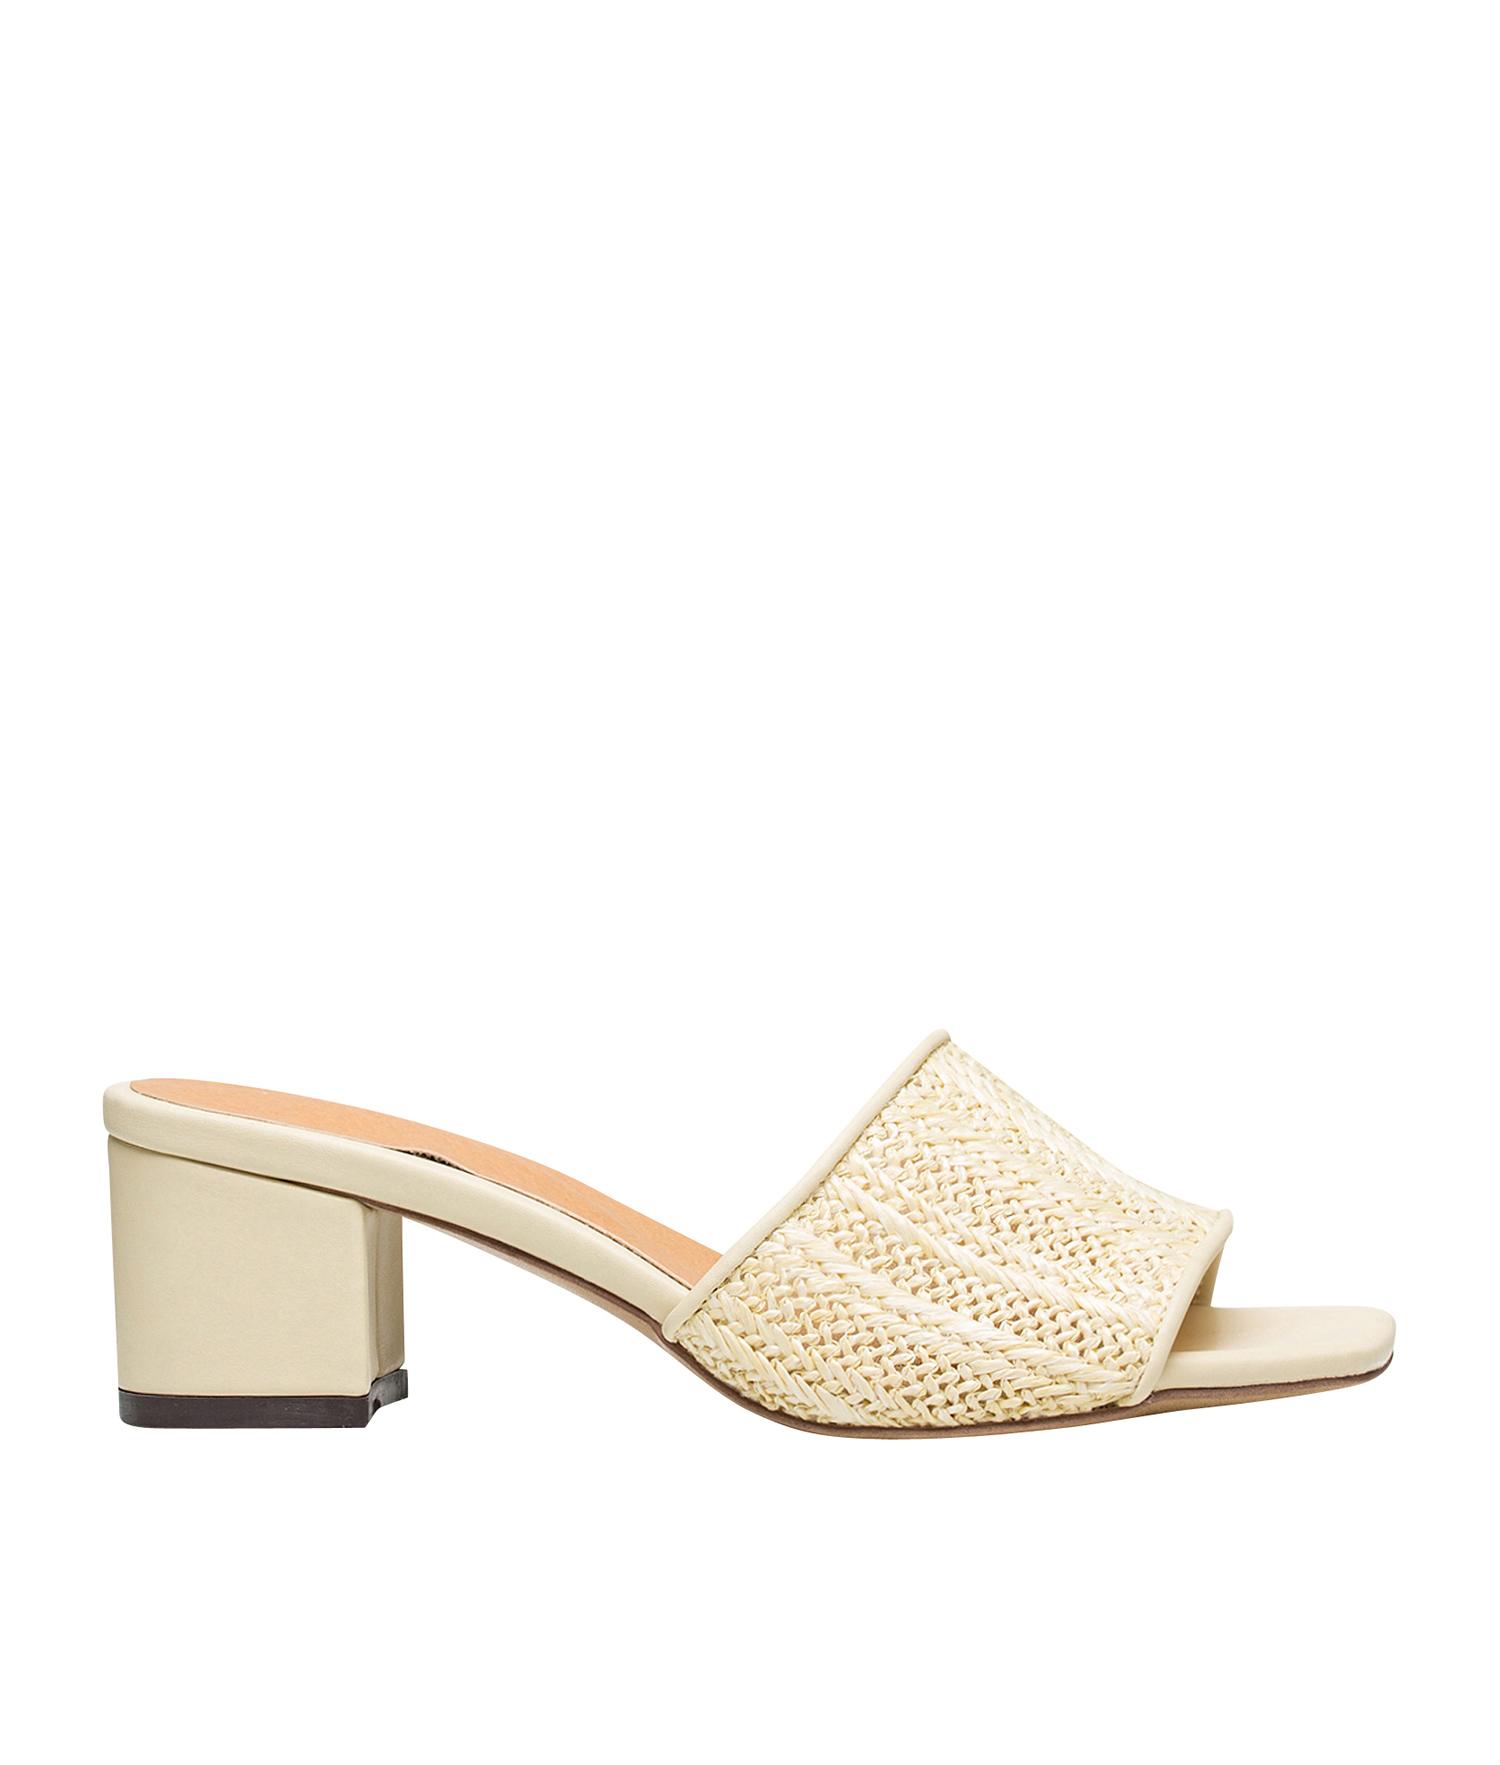 f526925f0e217 AnnaKastle Womens Natural Woven Slide Mule Heel Sandal Beige